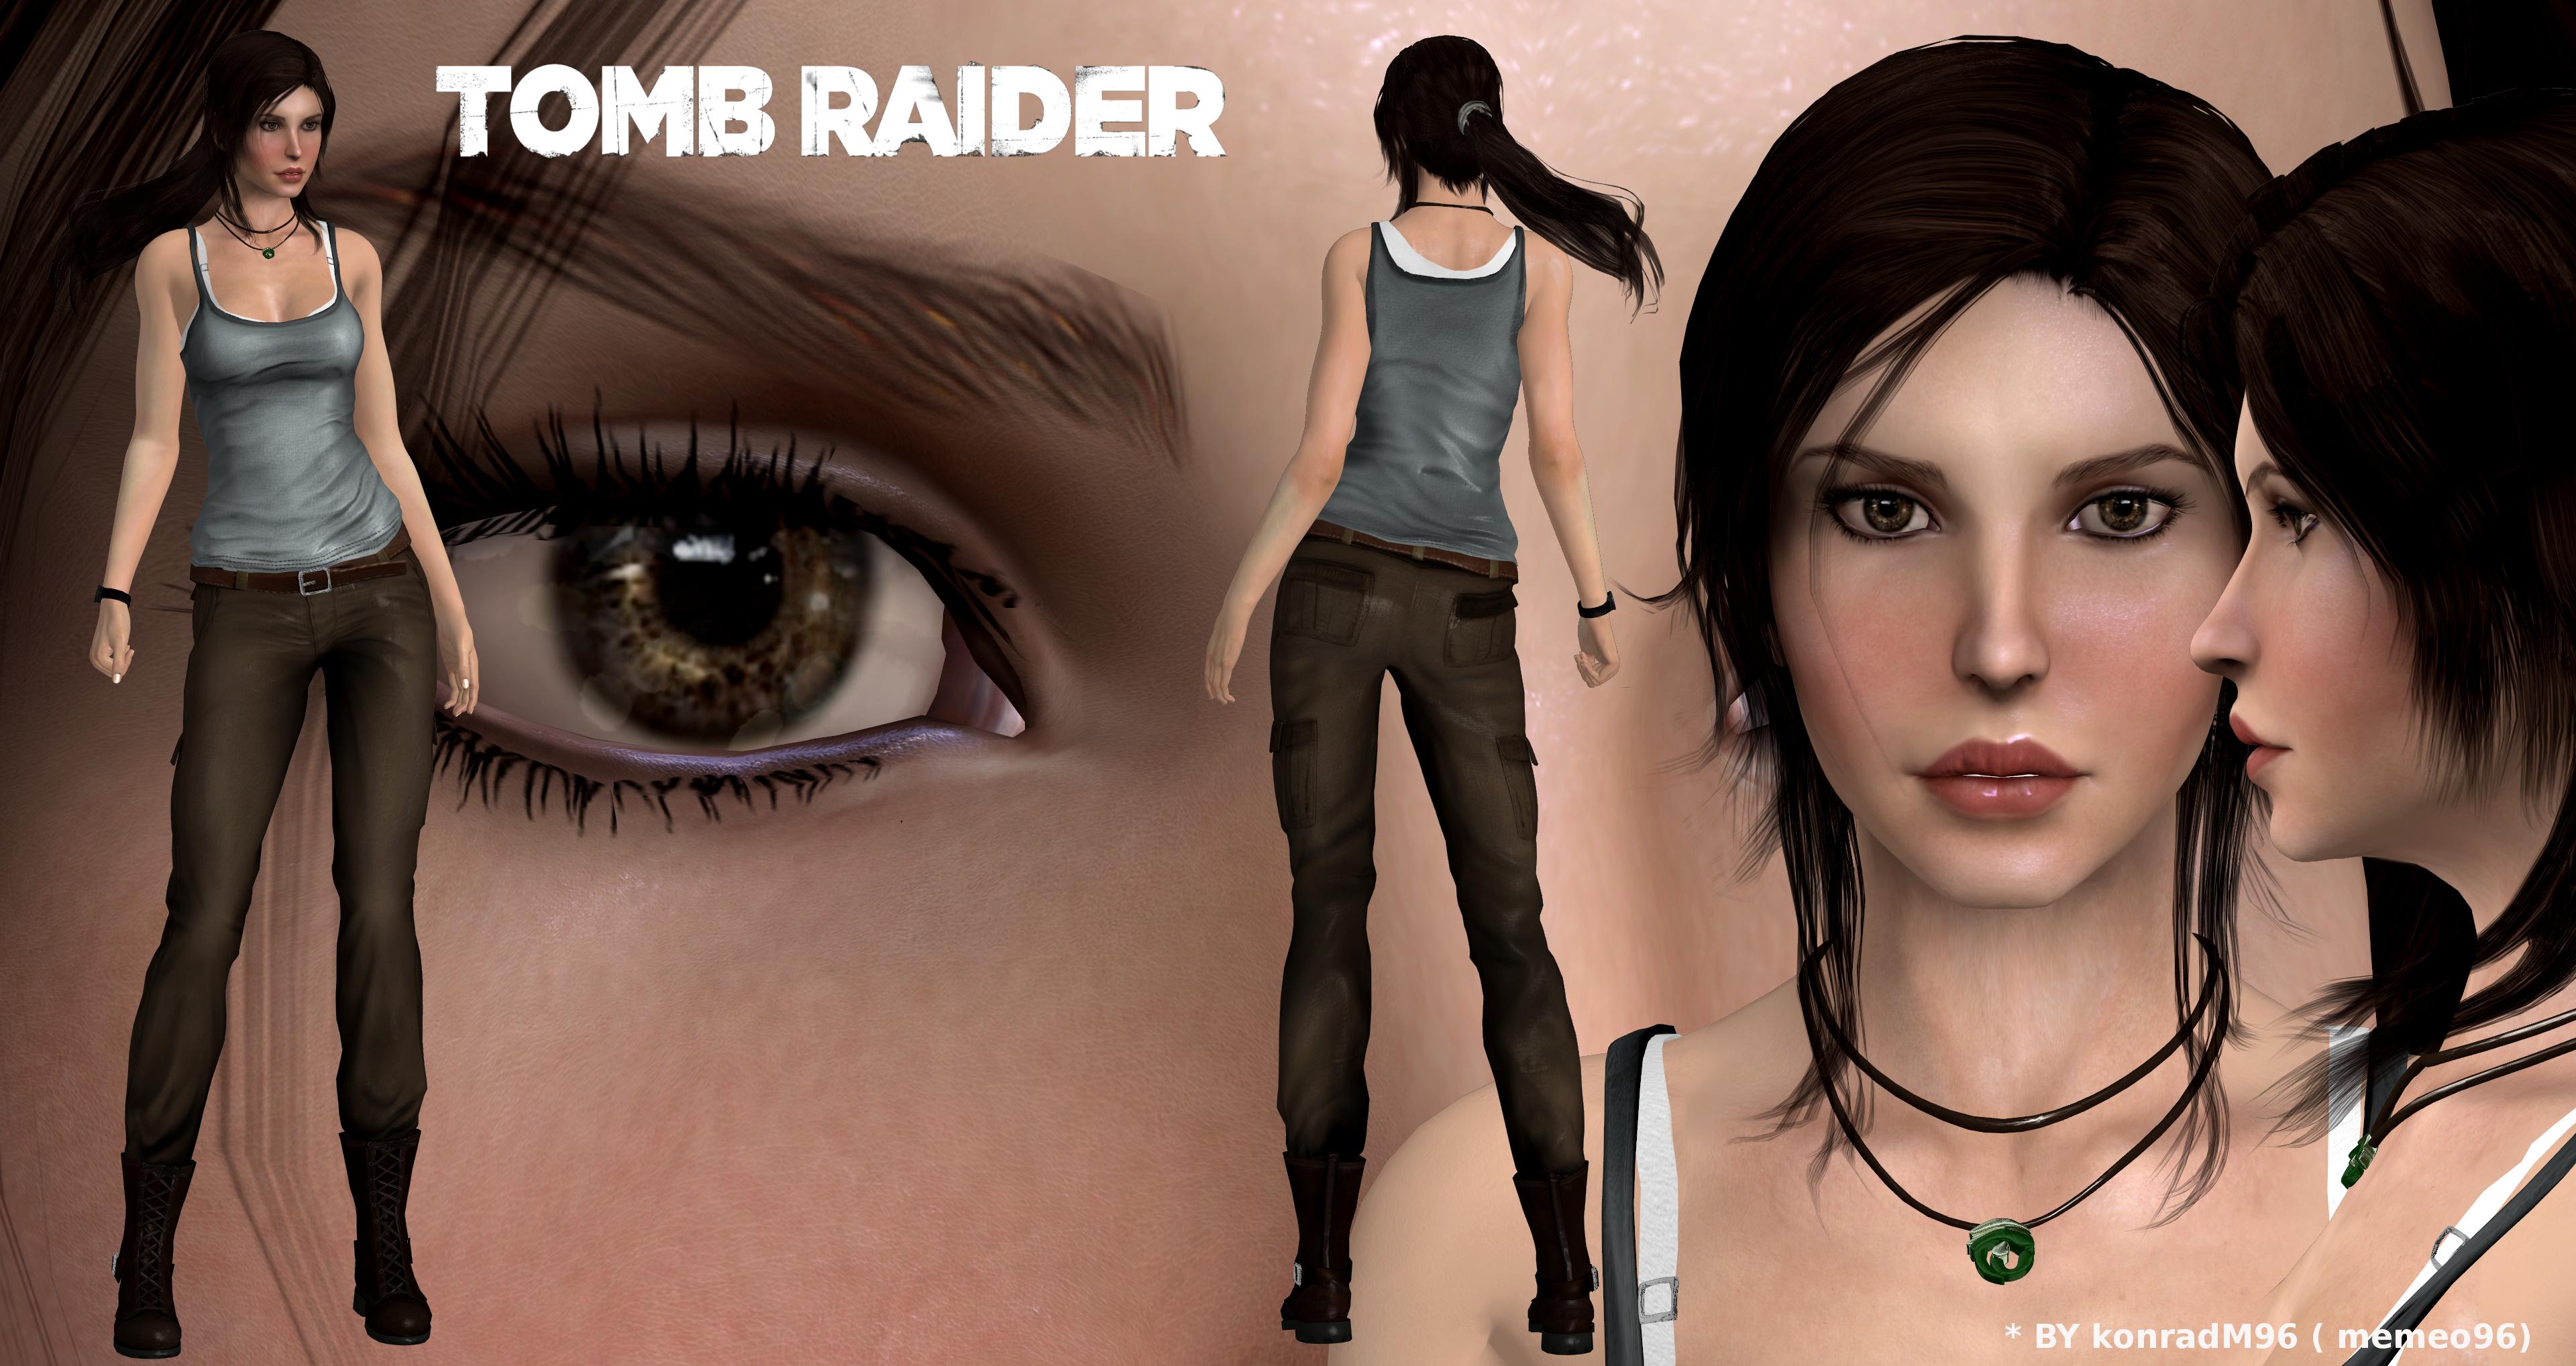 Tomb Raider 2013 Lara Croft Clean Model Release By Konradm96 On